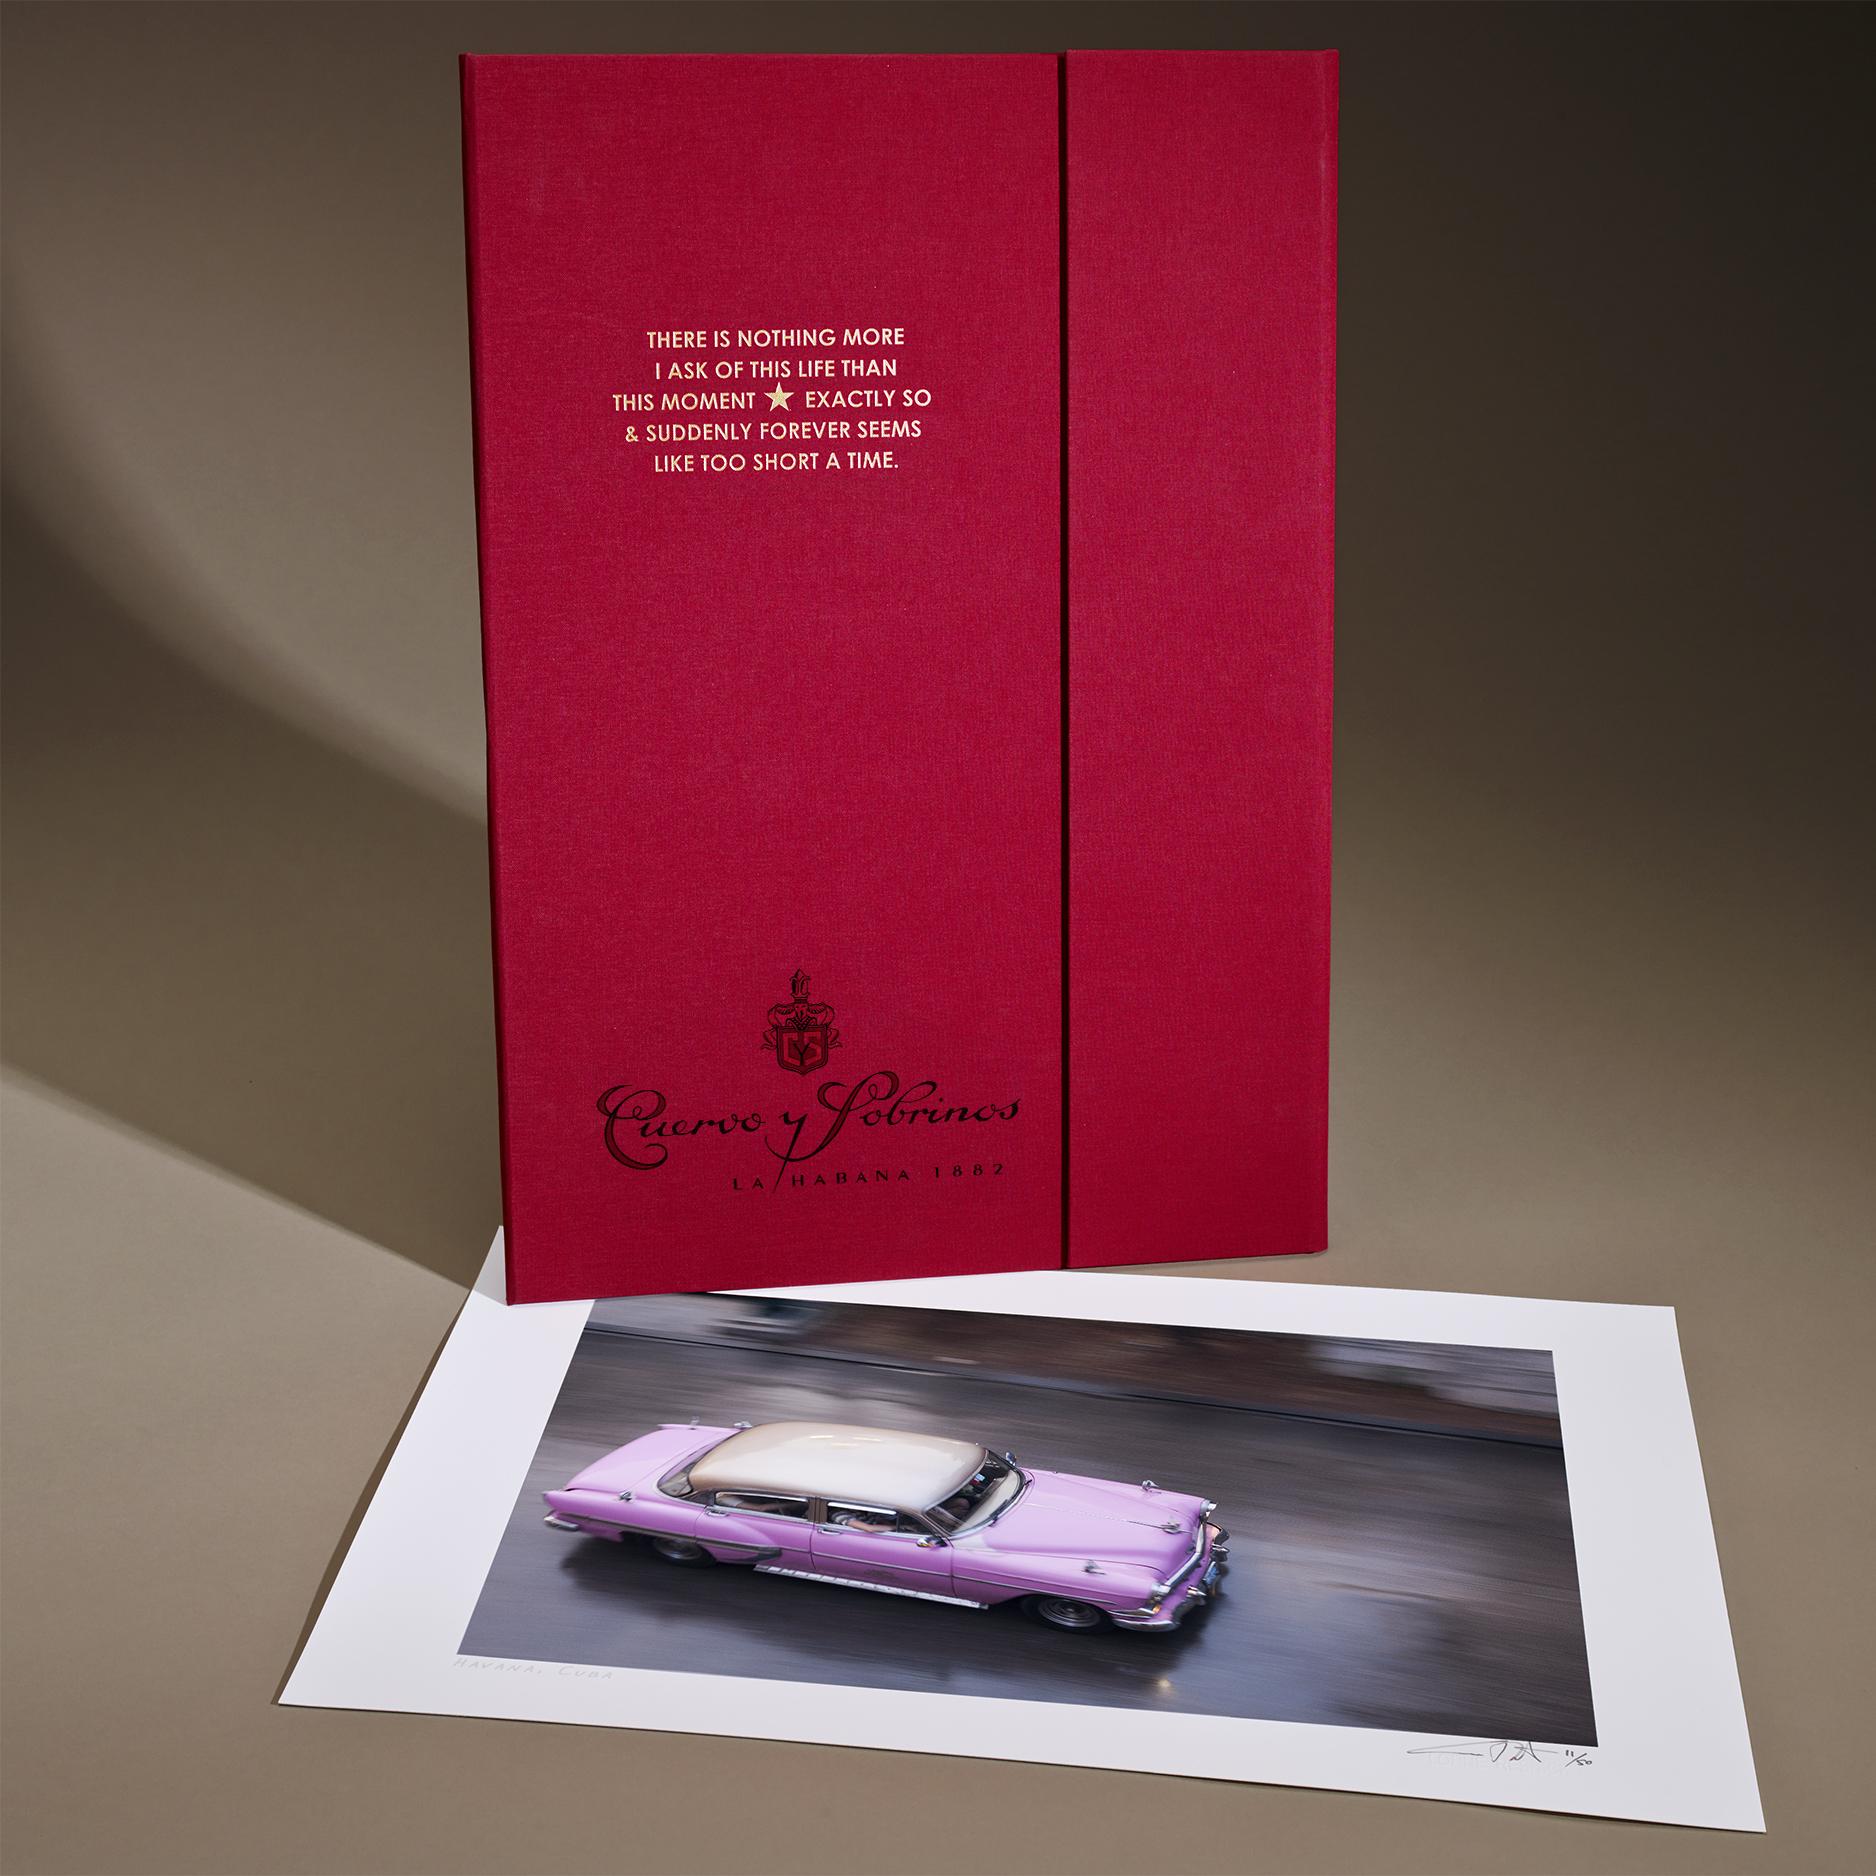 Fine Art print in red linen portfolio case:Retail price: $625.00– your price: $275.00 per print.